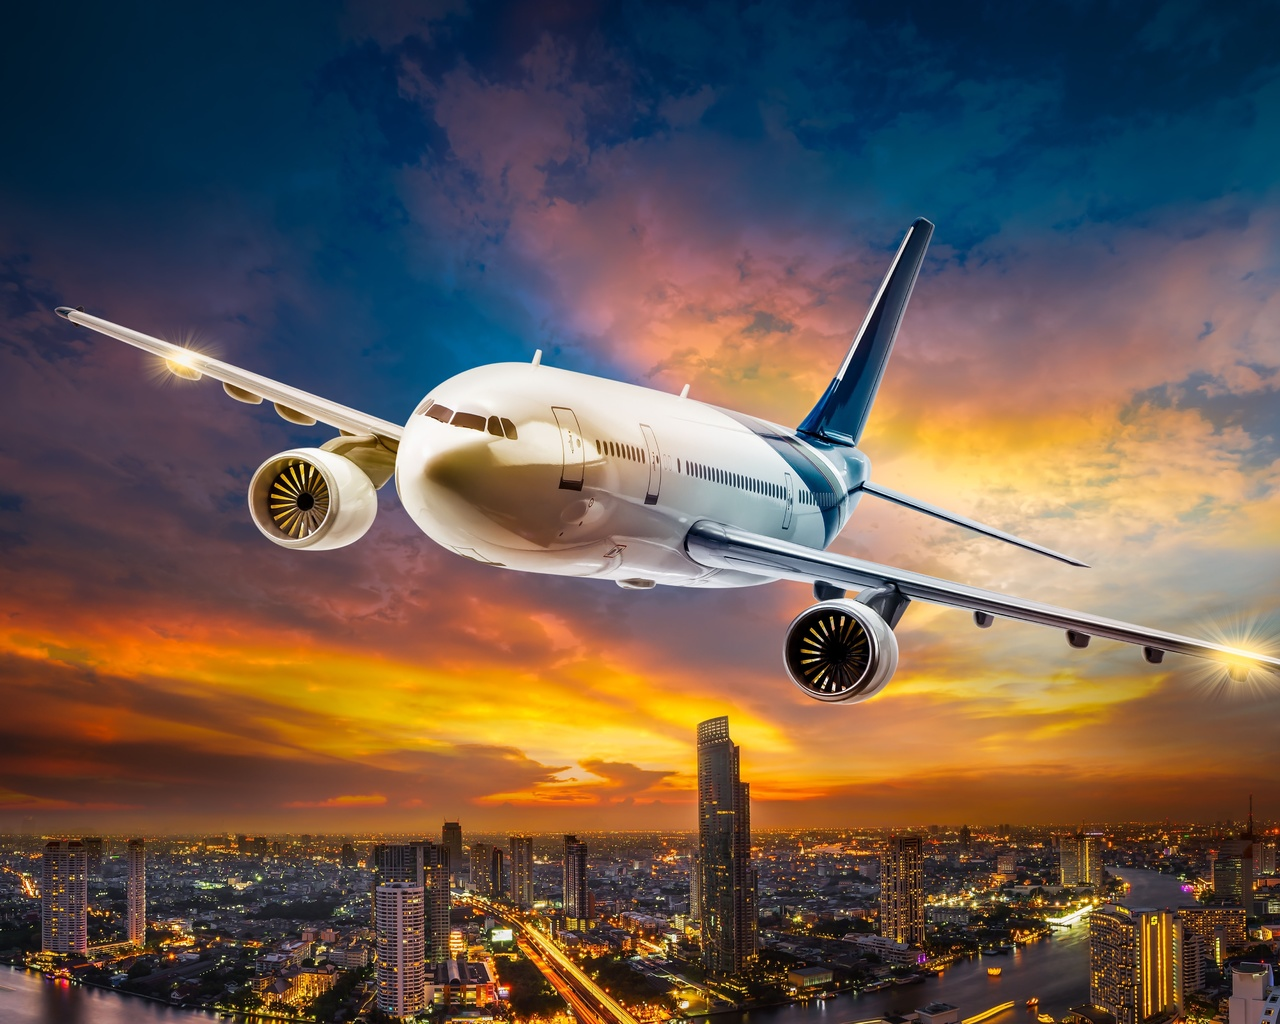 Ласковые слова, картинки картинки самолета